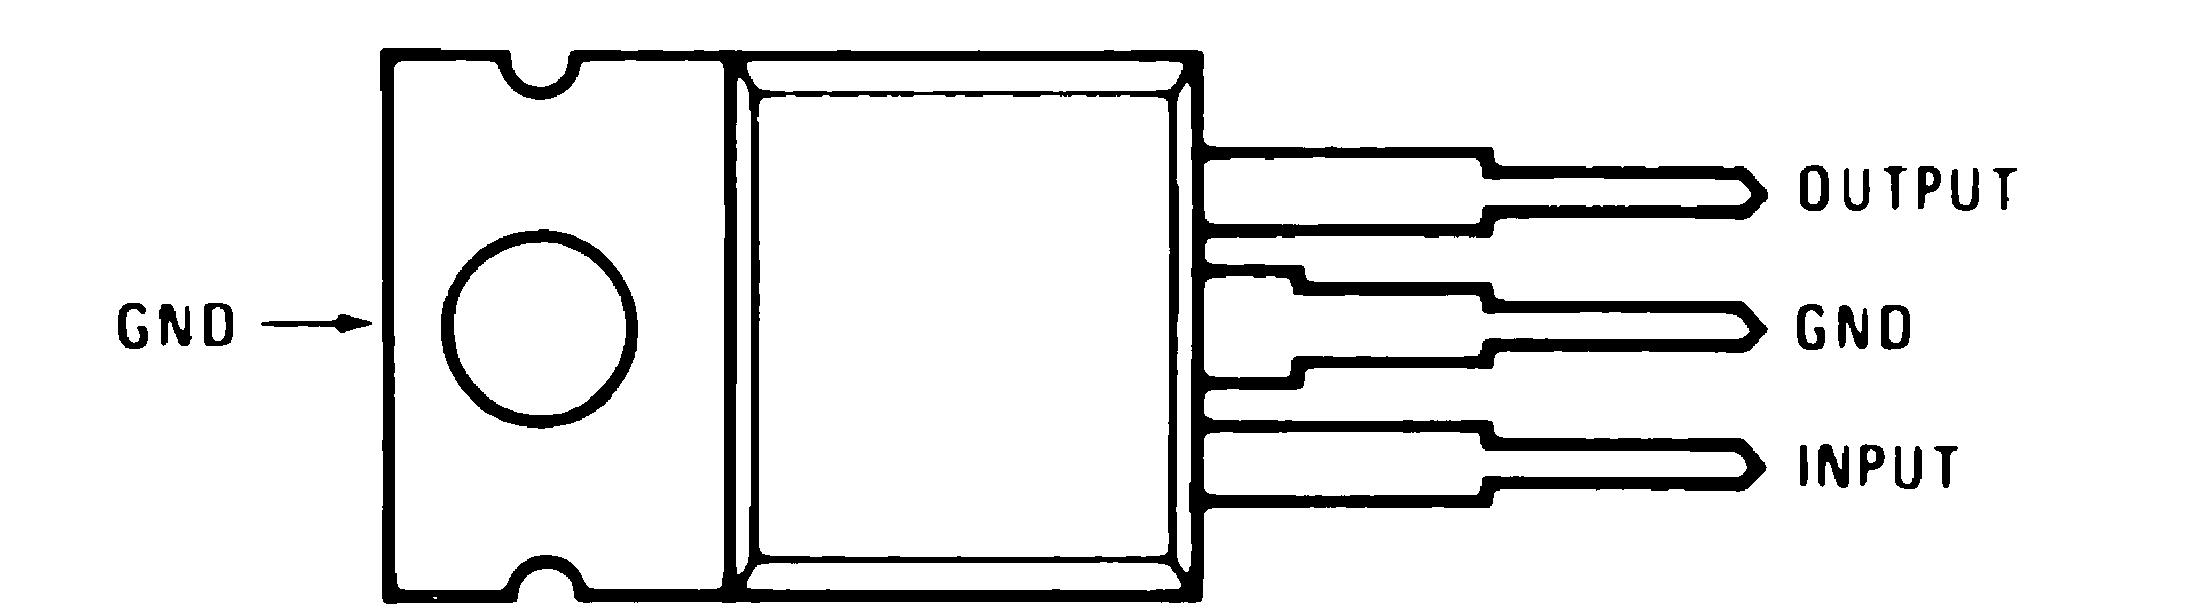 schaltregler als ersatz f r lm317. Black Bedroom Furniture Sets. Home Design Ideas